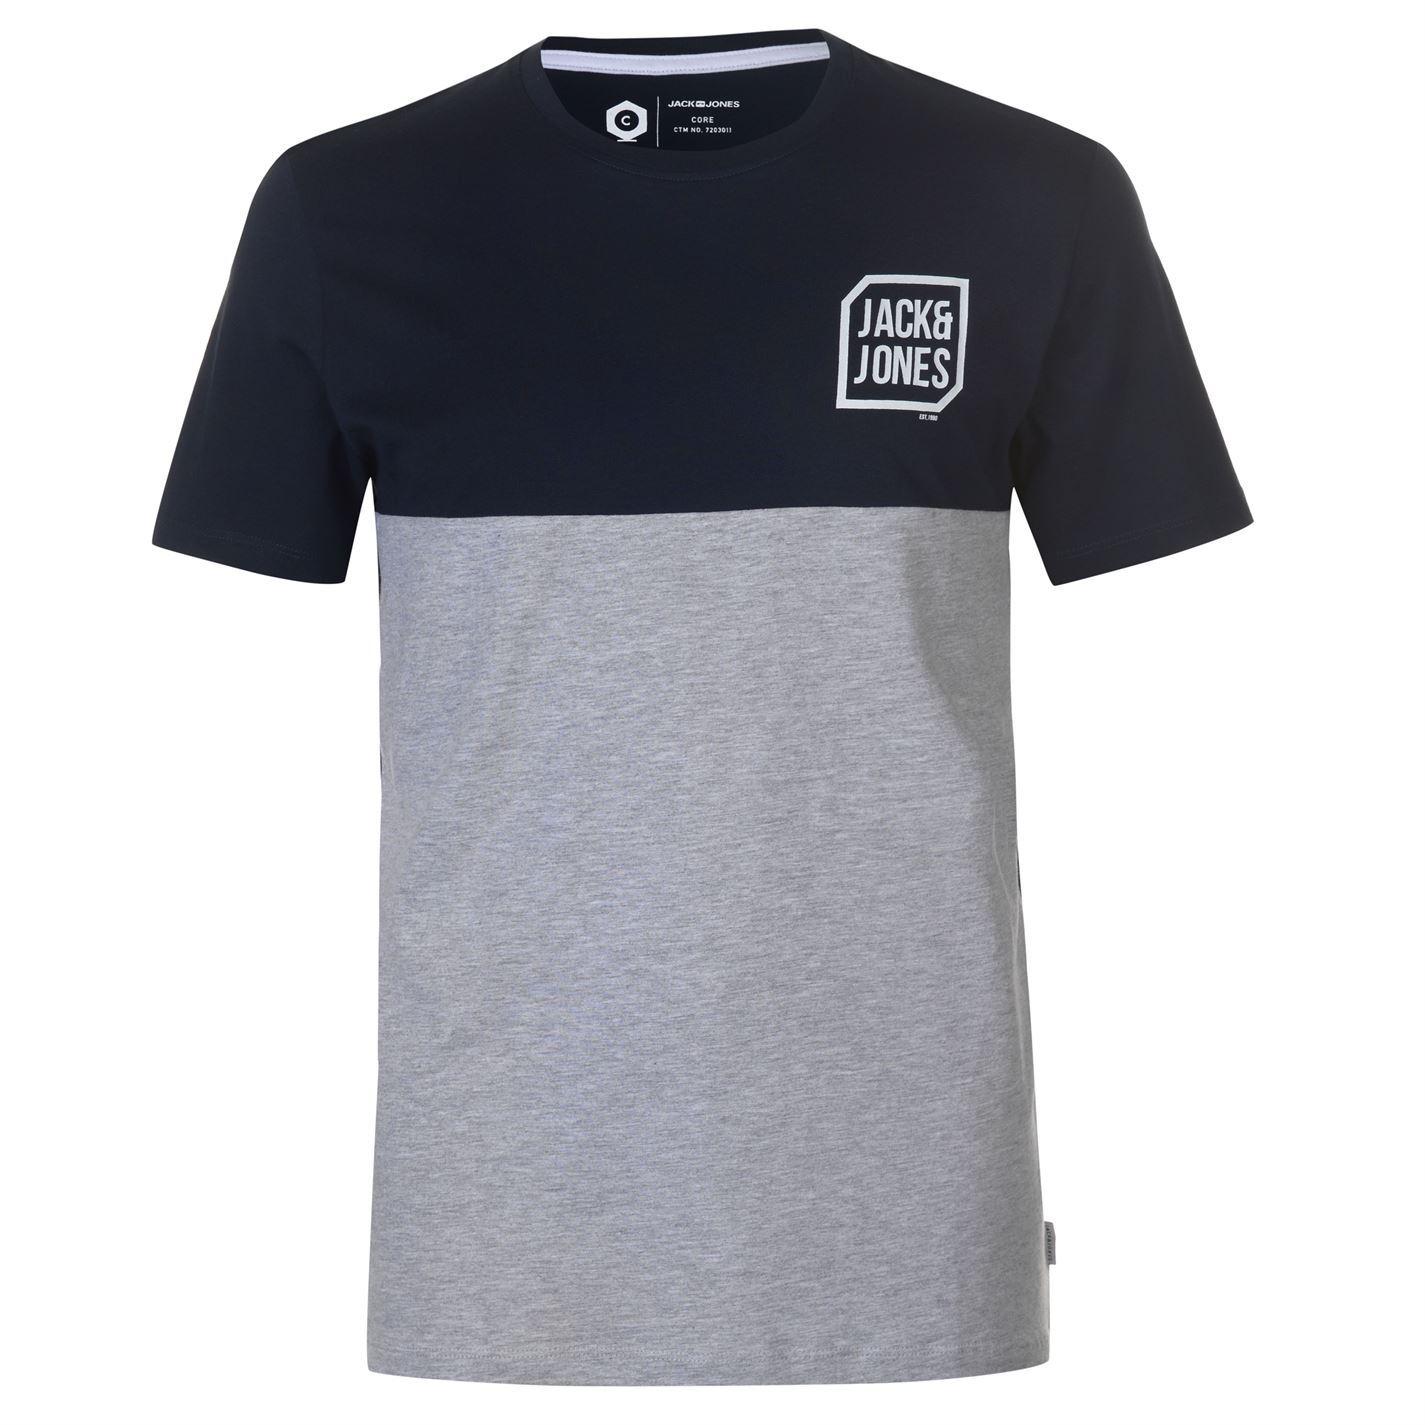 Jack-and-Jones-Core-Tern-T-Shirt-Mens-Tee-Shirt-Top thumbnail 6